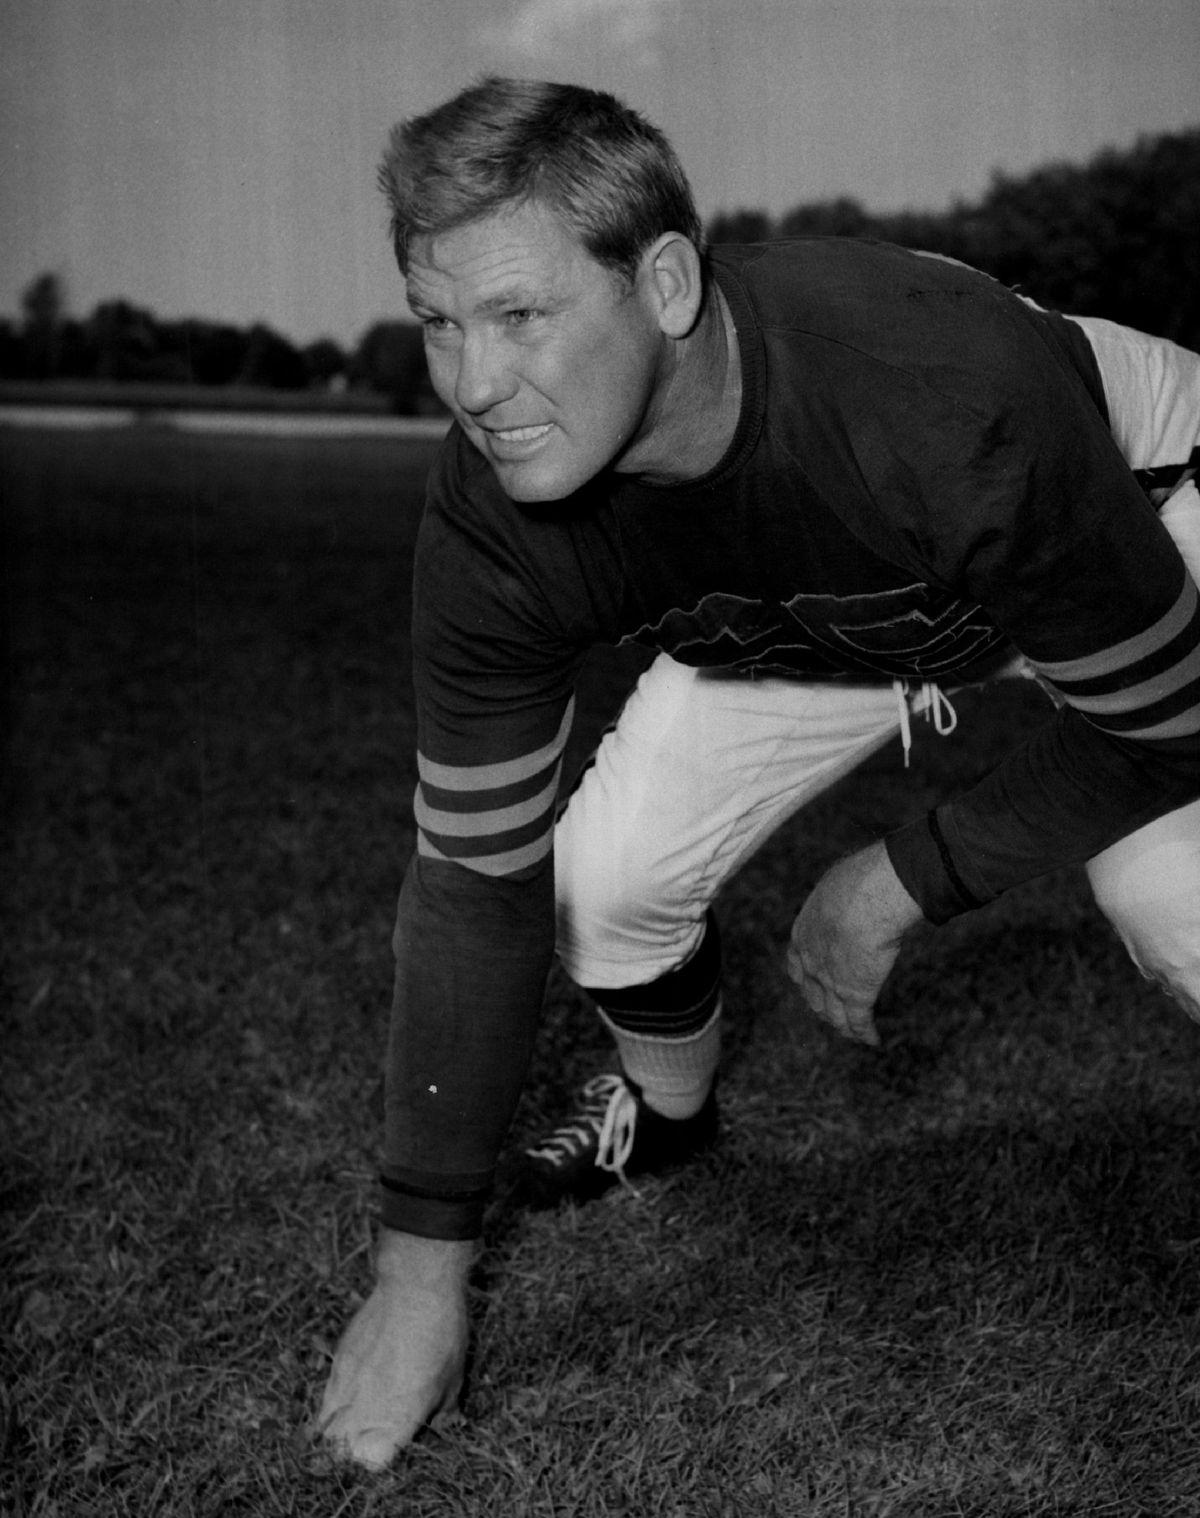 Clyde Turner - Chicago Bears